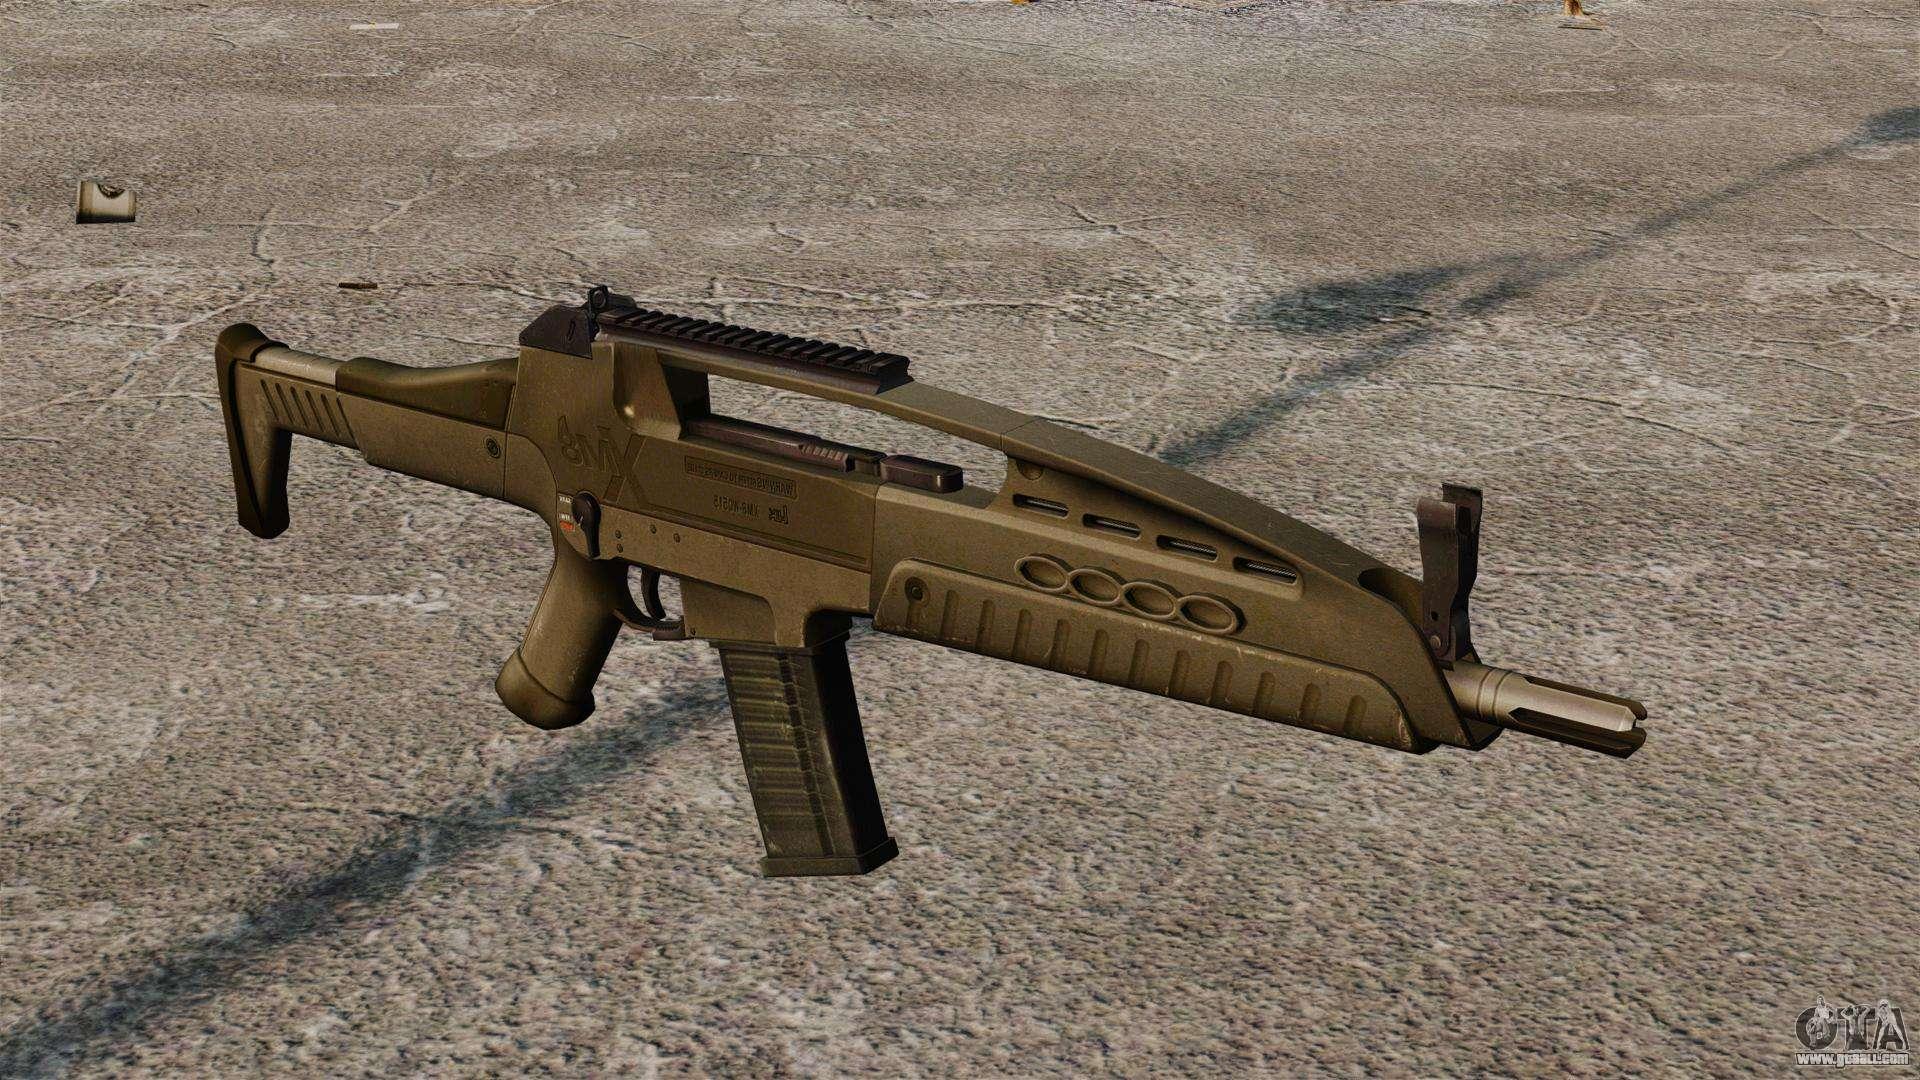 HK XM8 Assault Rifle f...